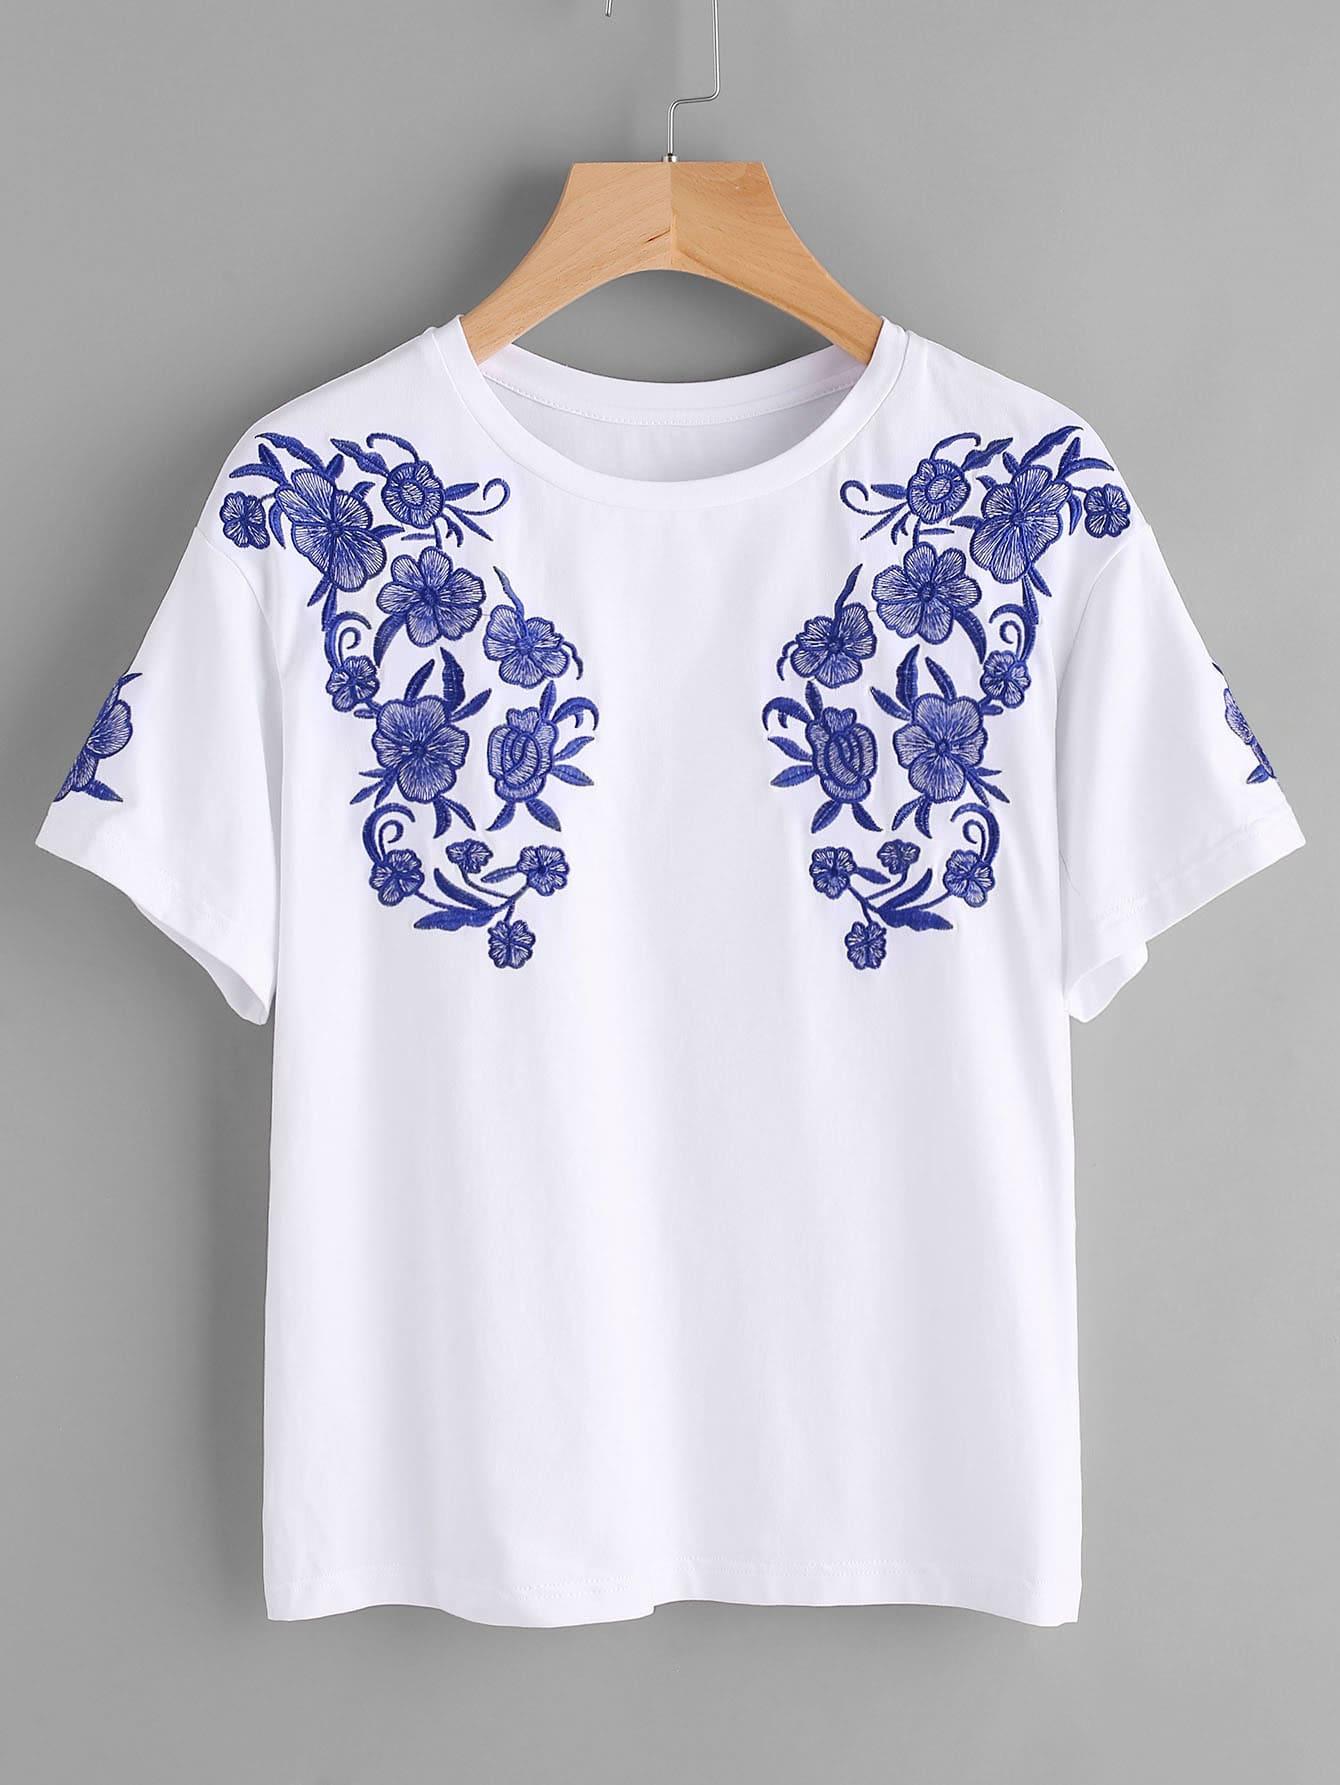 Symmetric flower embroidery t shirt makemechic